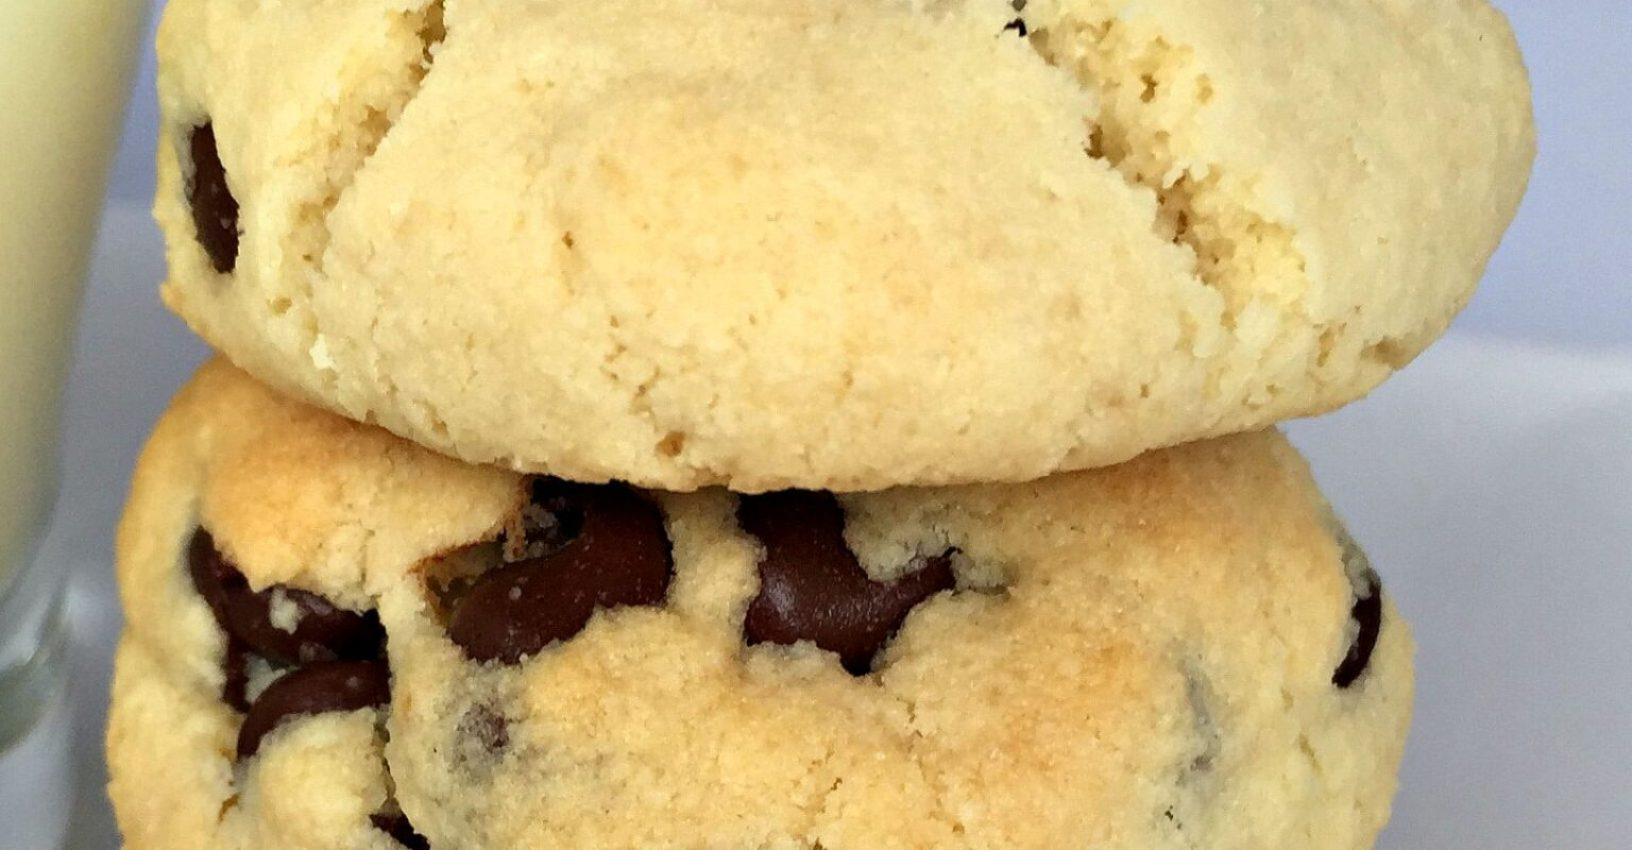 Gluten Free Almond Flour Chocolate Chip Cookies Recipe